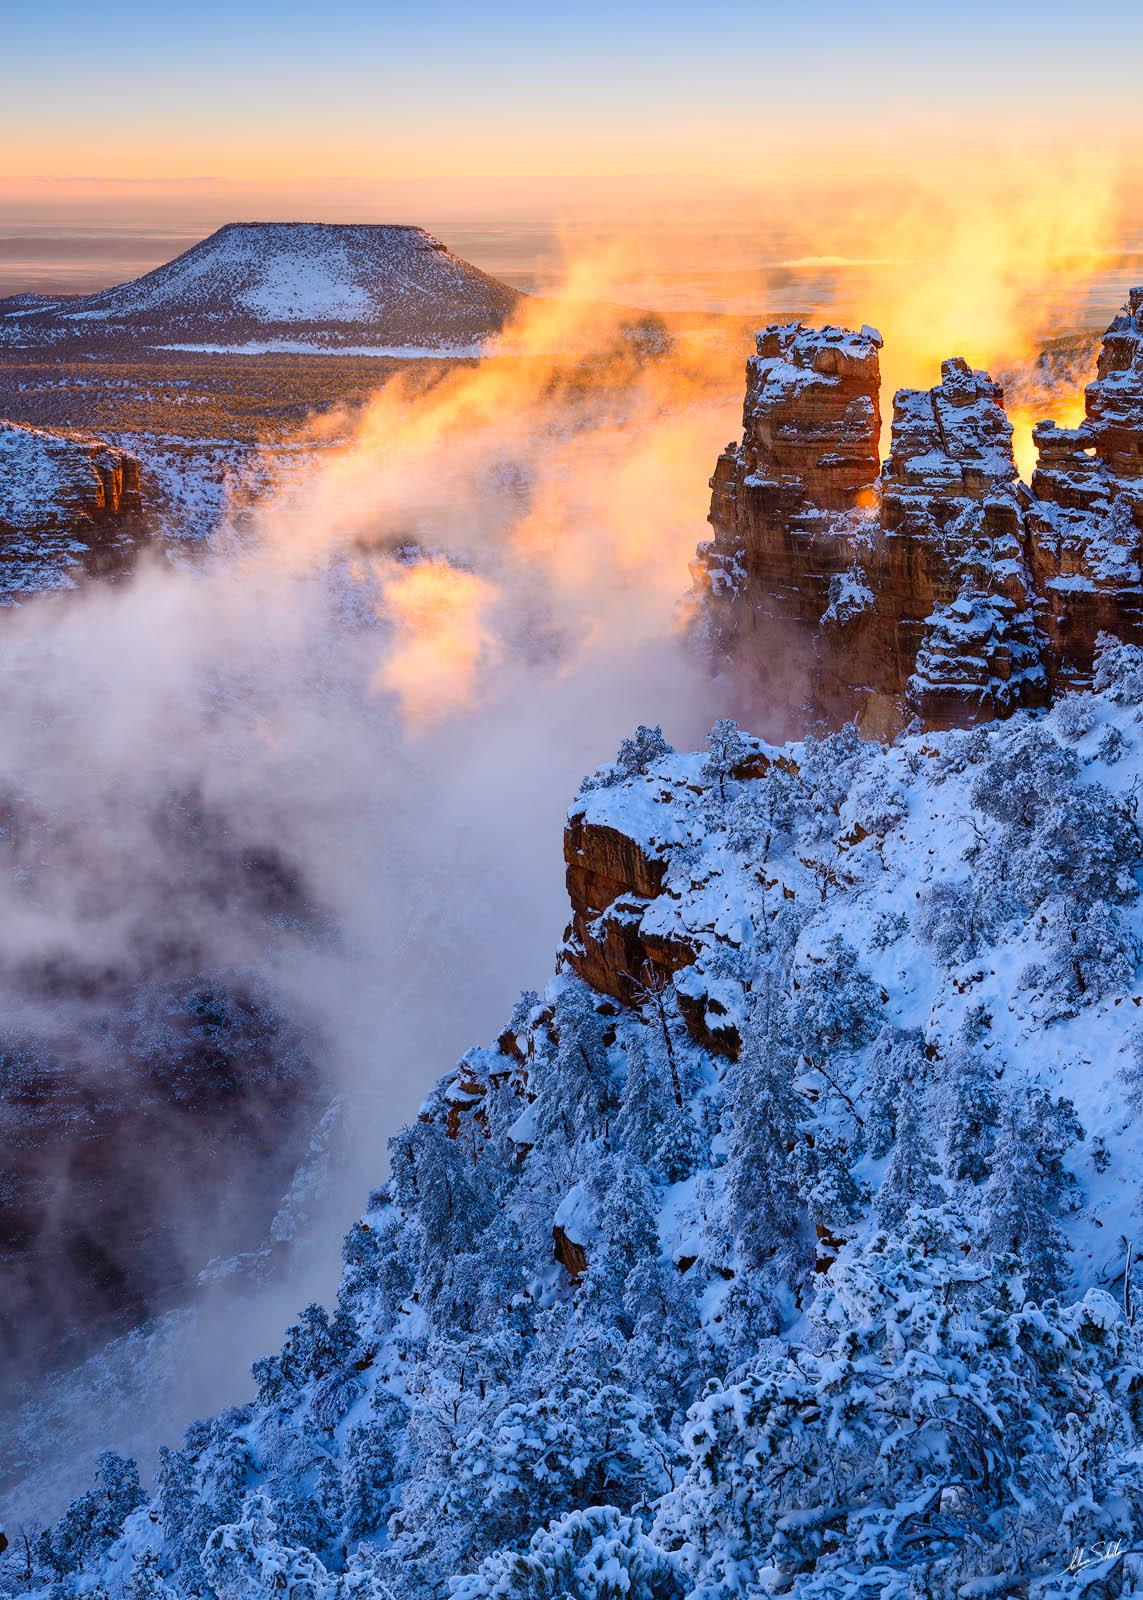 AZ, Arizona, Cedar Mountain, Clouds, Desert View, Grand Canyon, Snow, South Rim, Sunrise, Temperature Inversion, Winter, photo